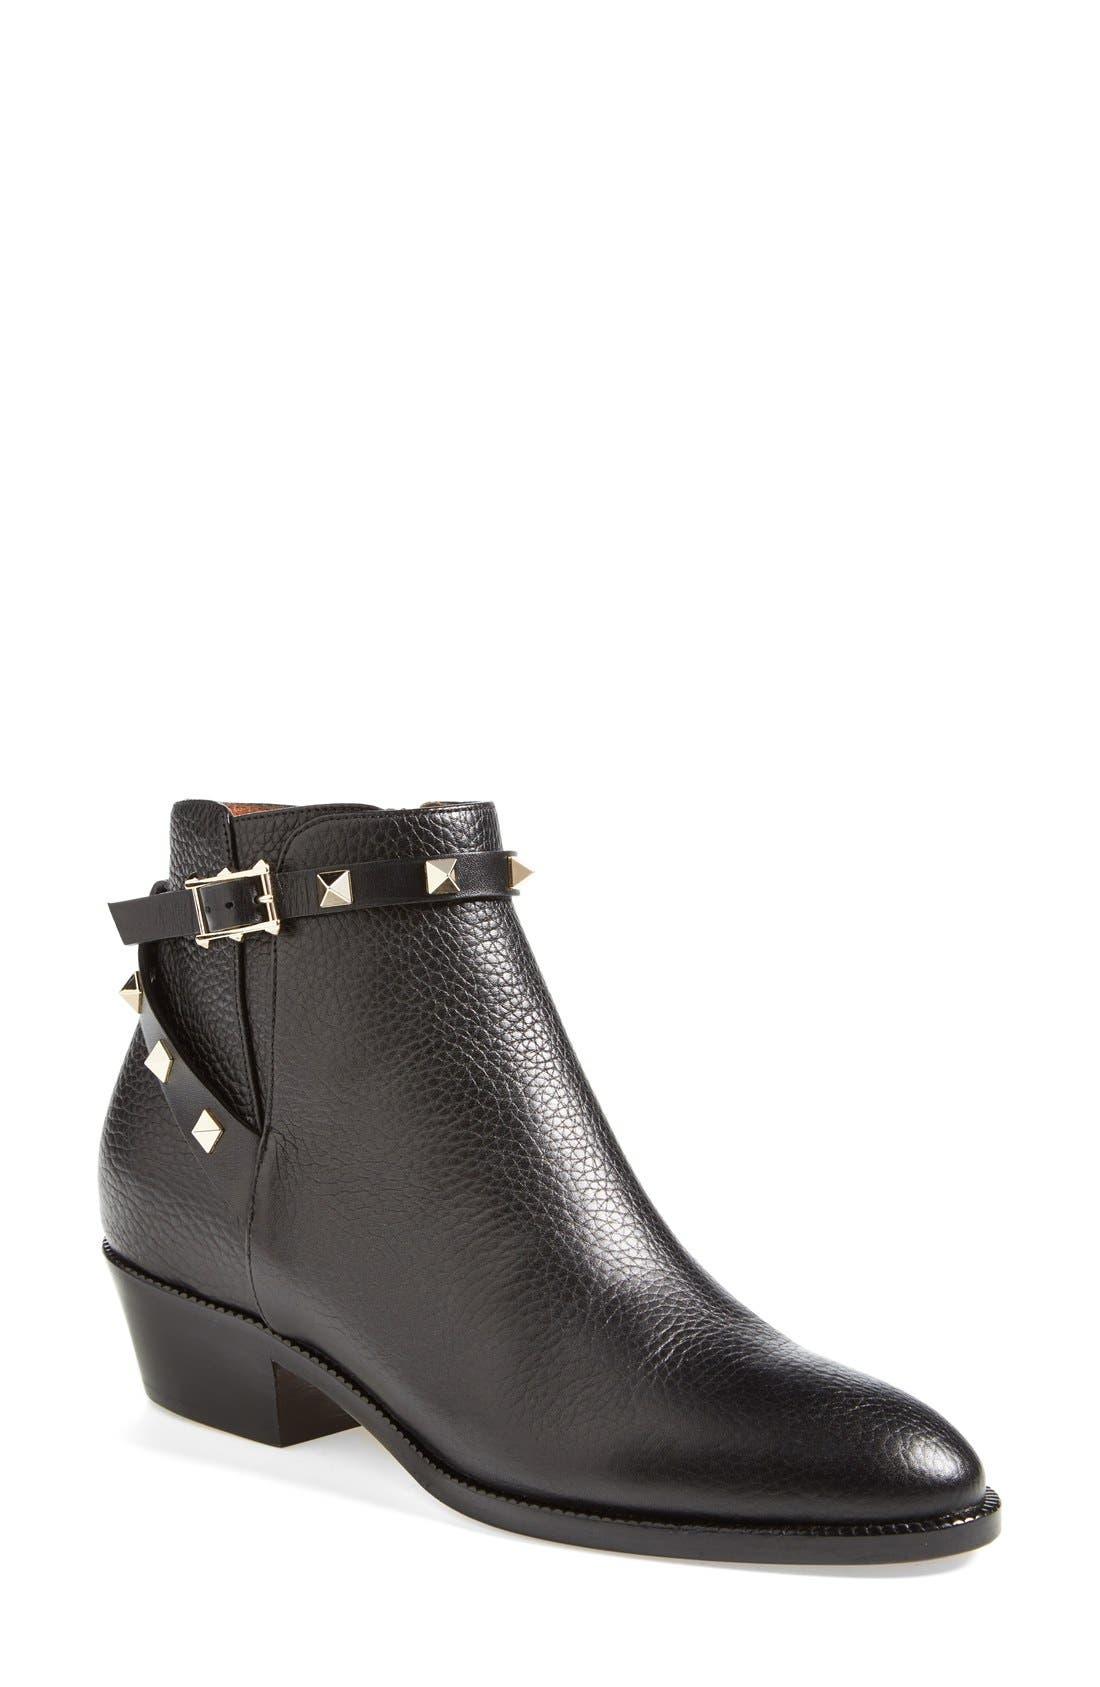 Main Image - Valentino 'Rockstud' Ankle Boot (Women)